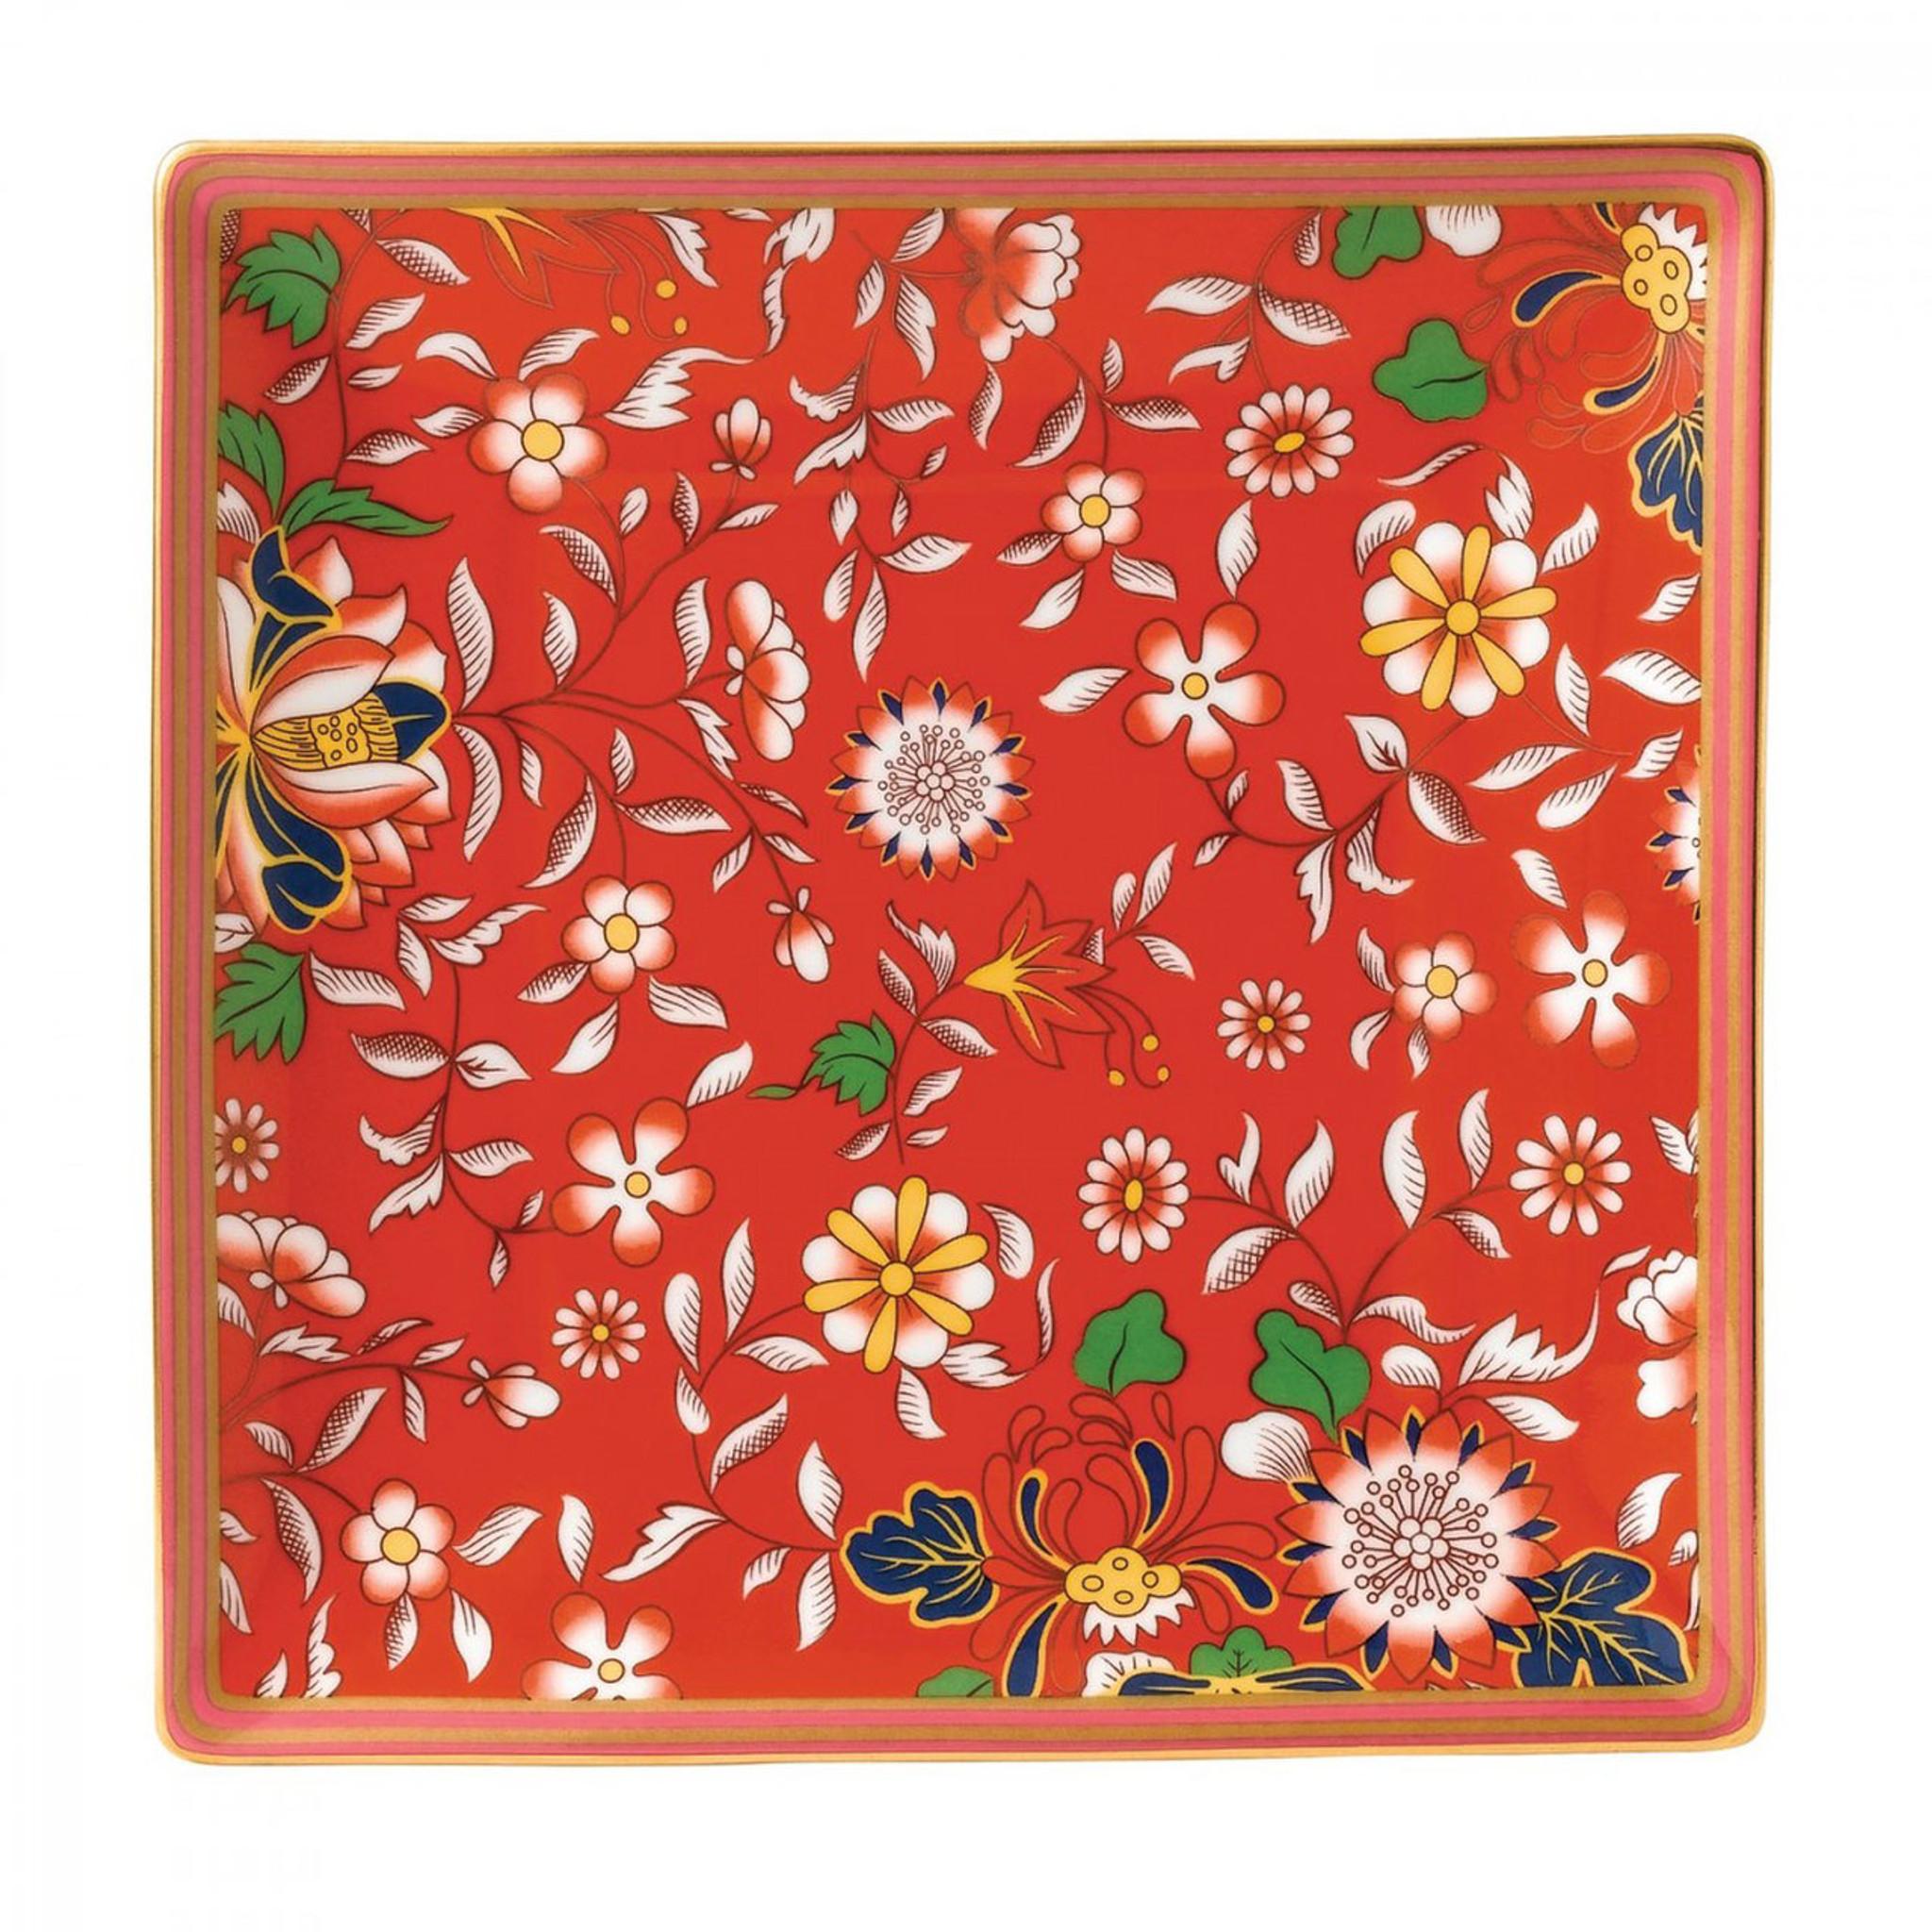 Large Multicolor Carolines Treasures 7501TH68 Dachshund Leash Holder or Key Hook